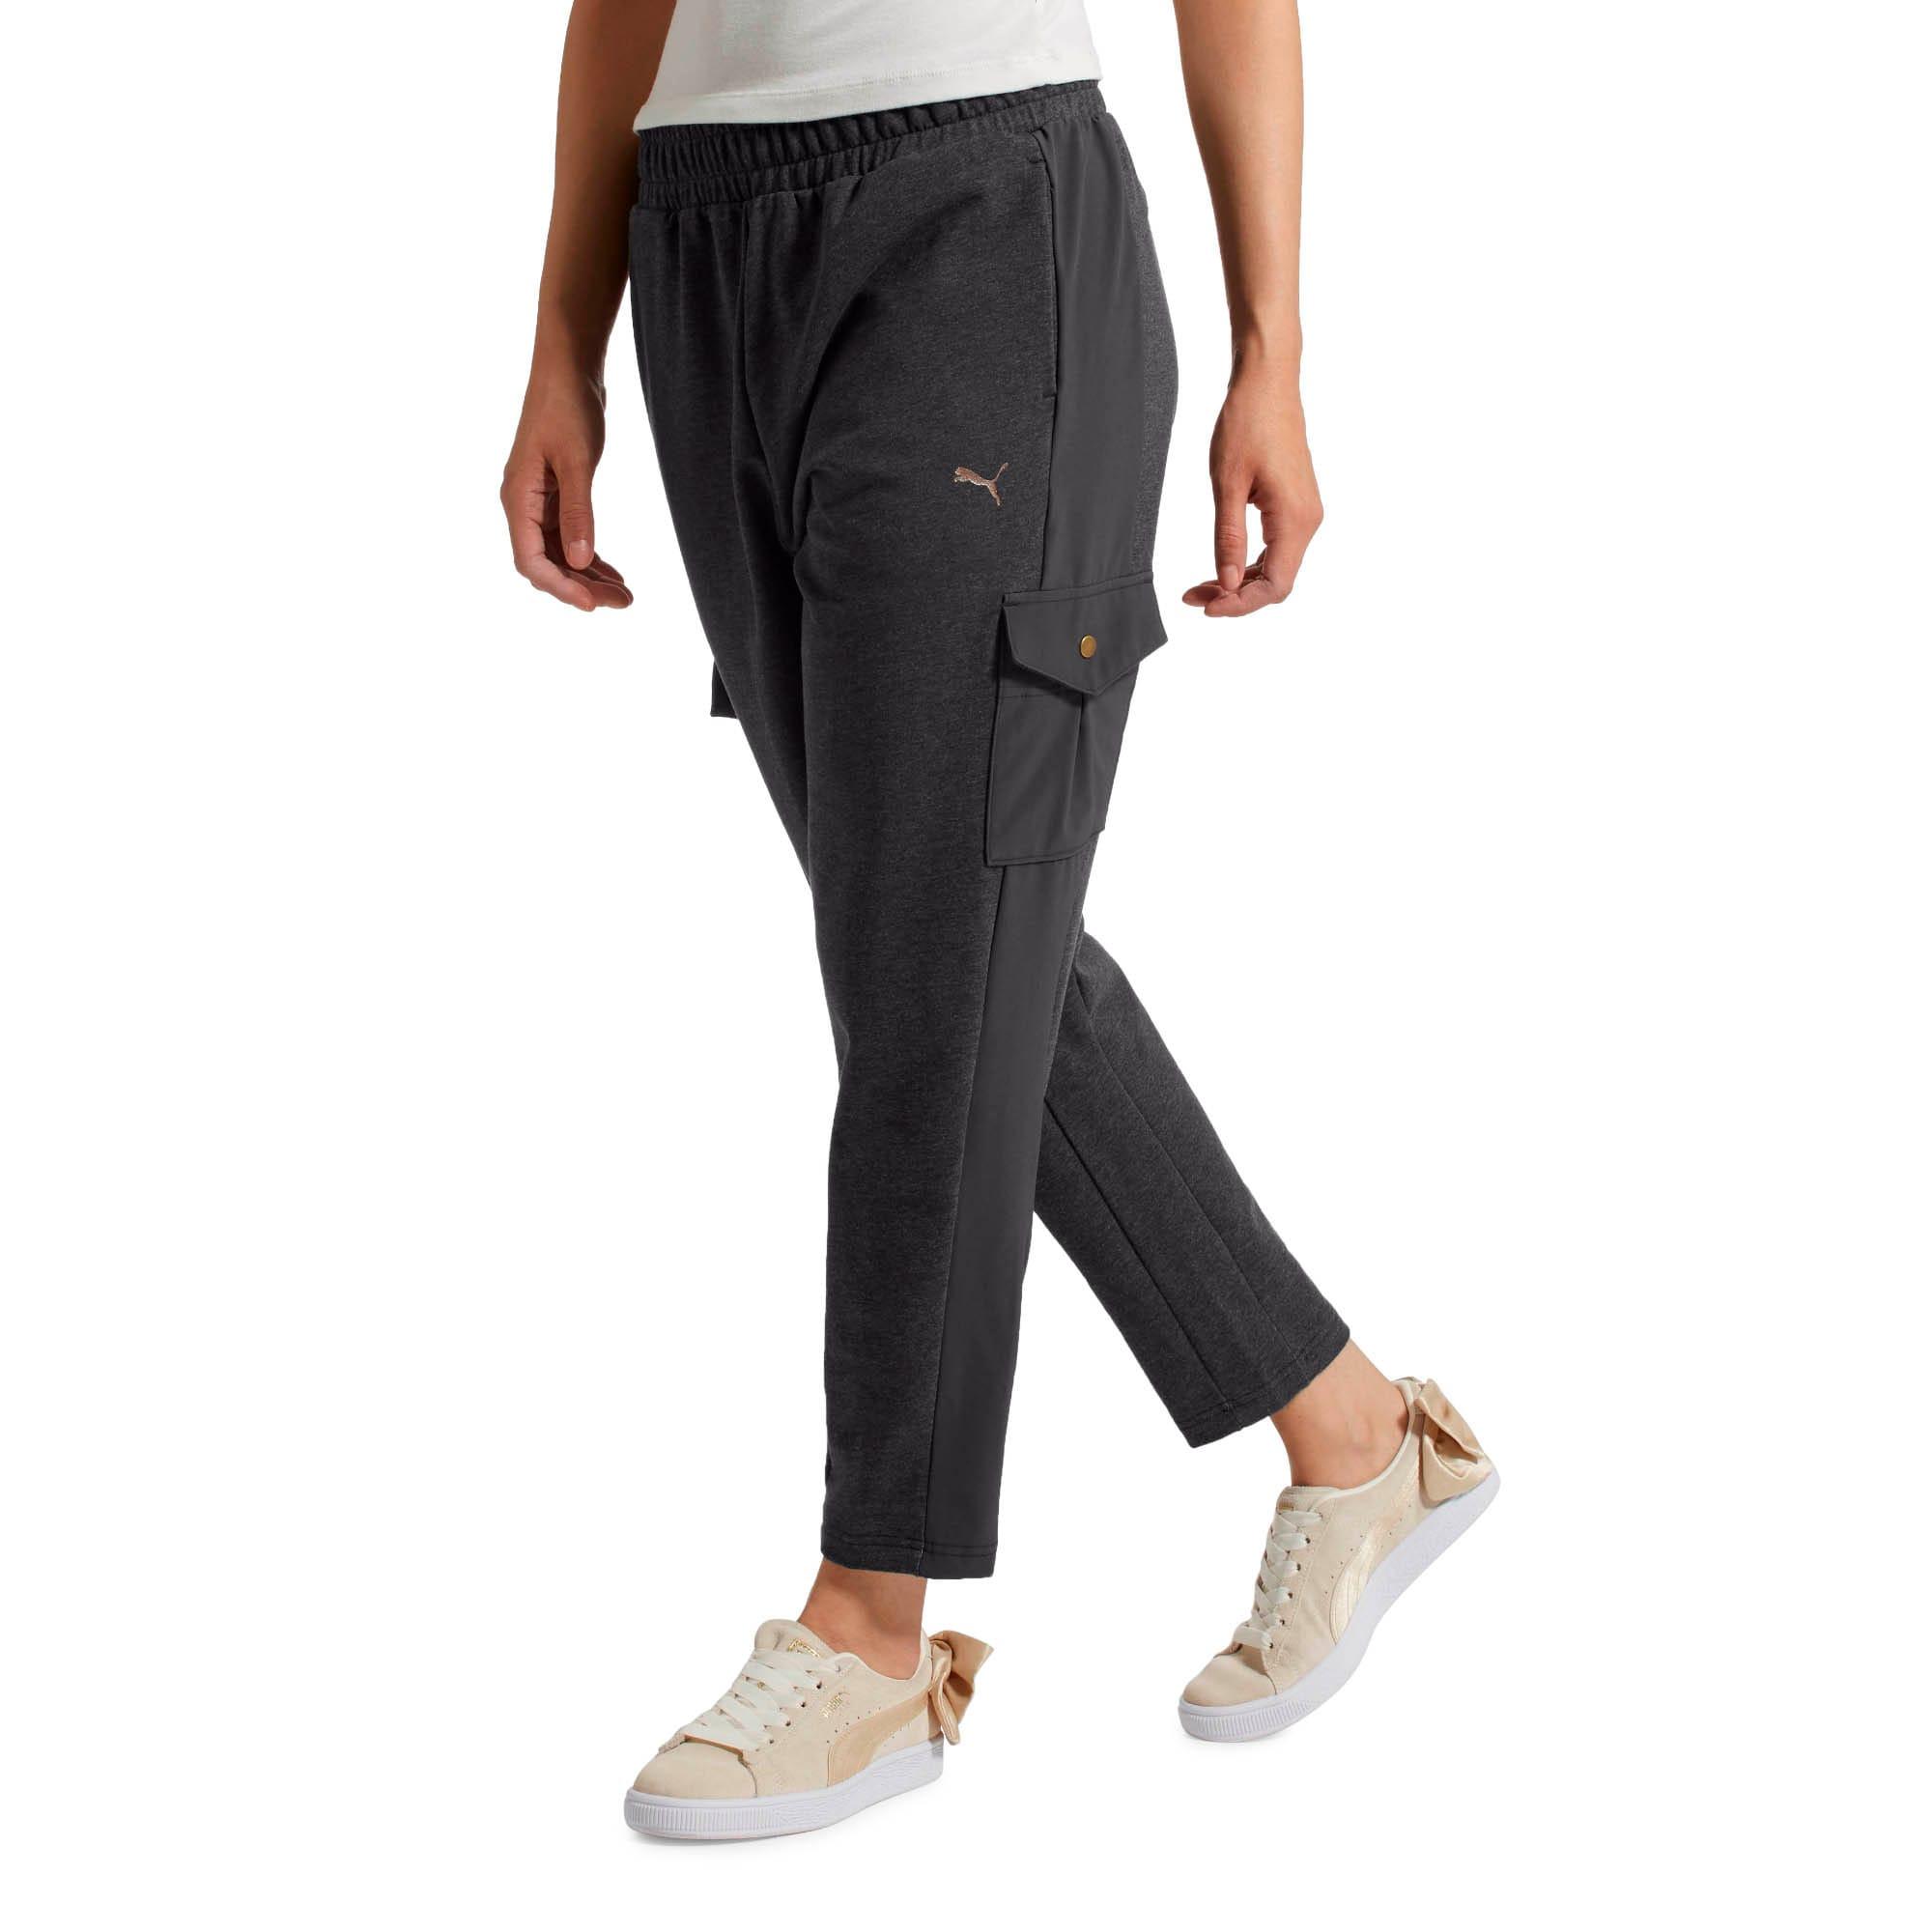 Thumbnail 2 of FUSION Pants, Dark Gray Heather, medium